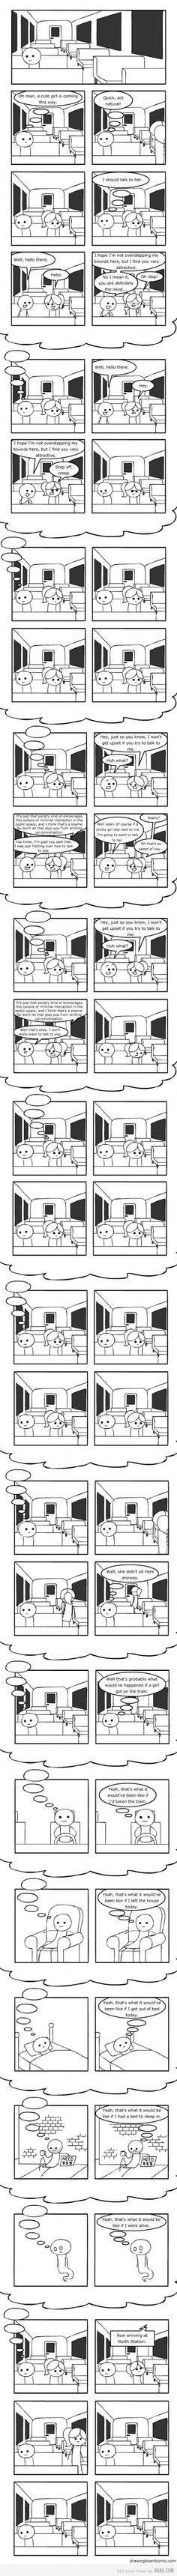 Just talk to her… #comic #comicstrip #cartoon